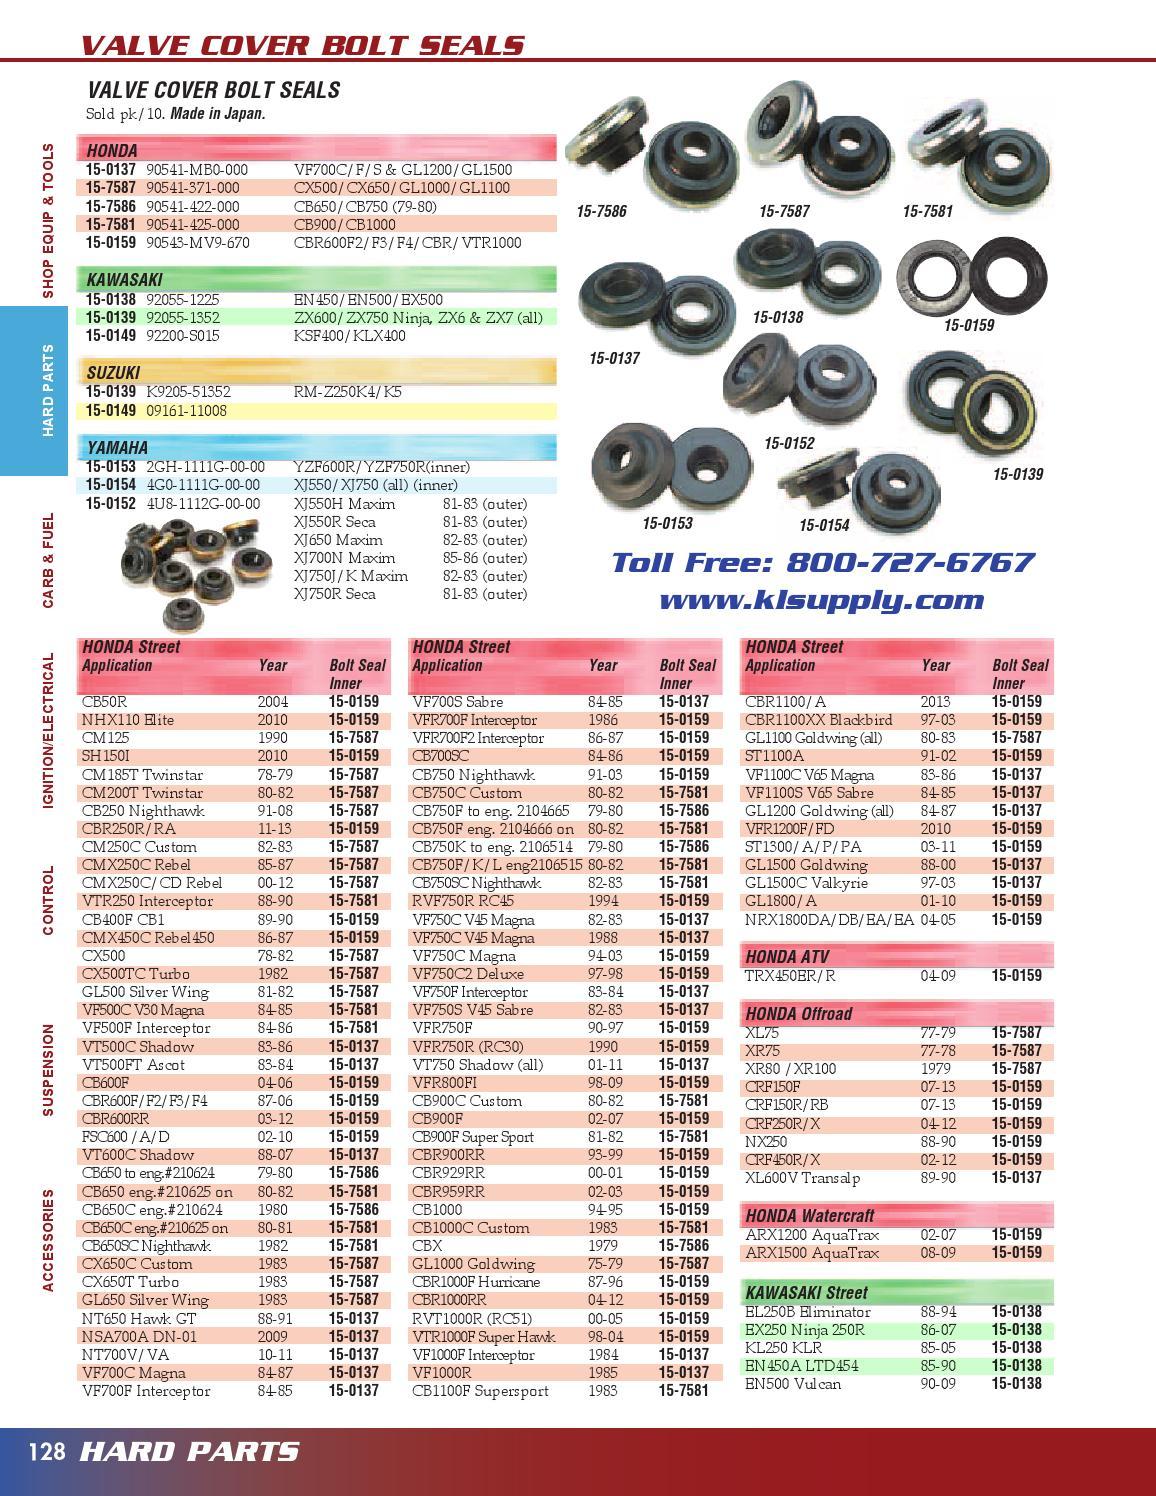 79-80 CB650 CB750F CB750K Valve Cover Bolt Seals 90541-422-000 1979 Honda CBX